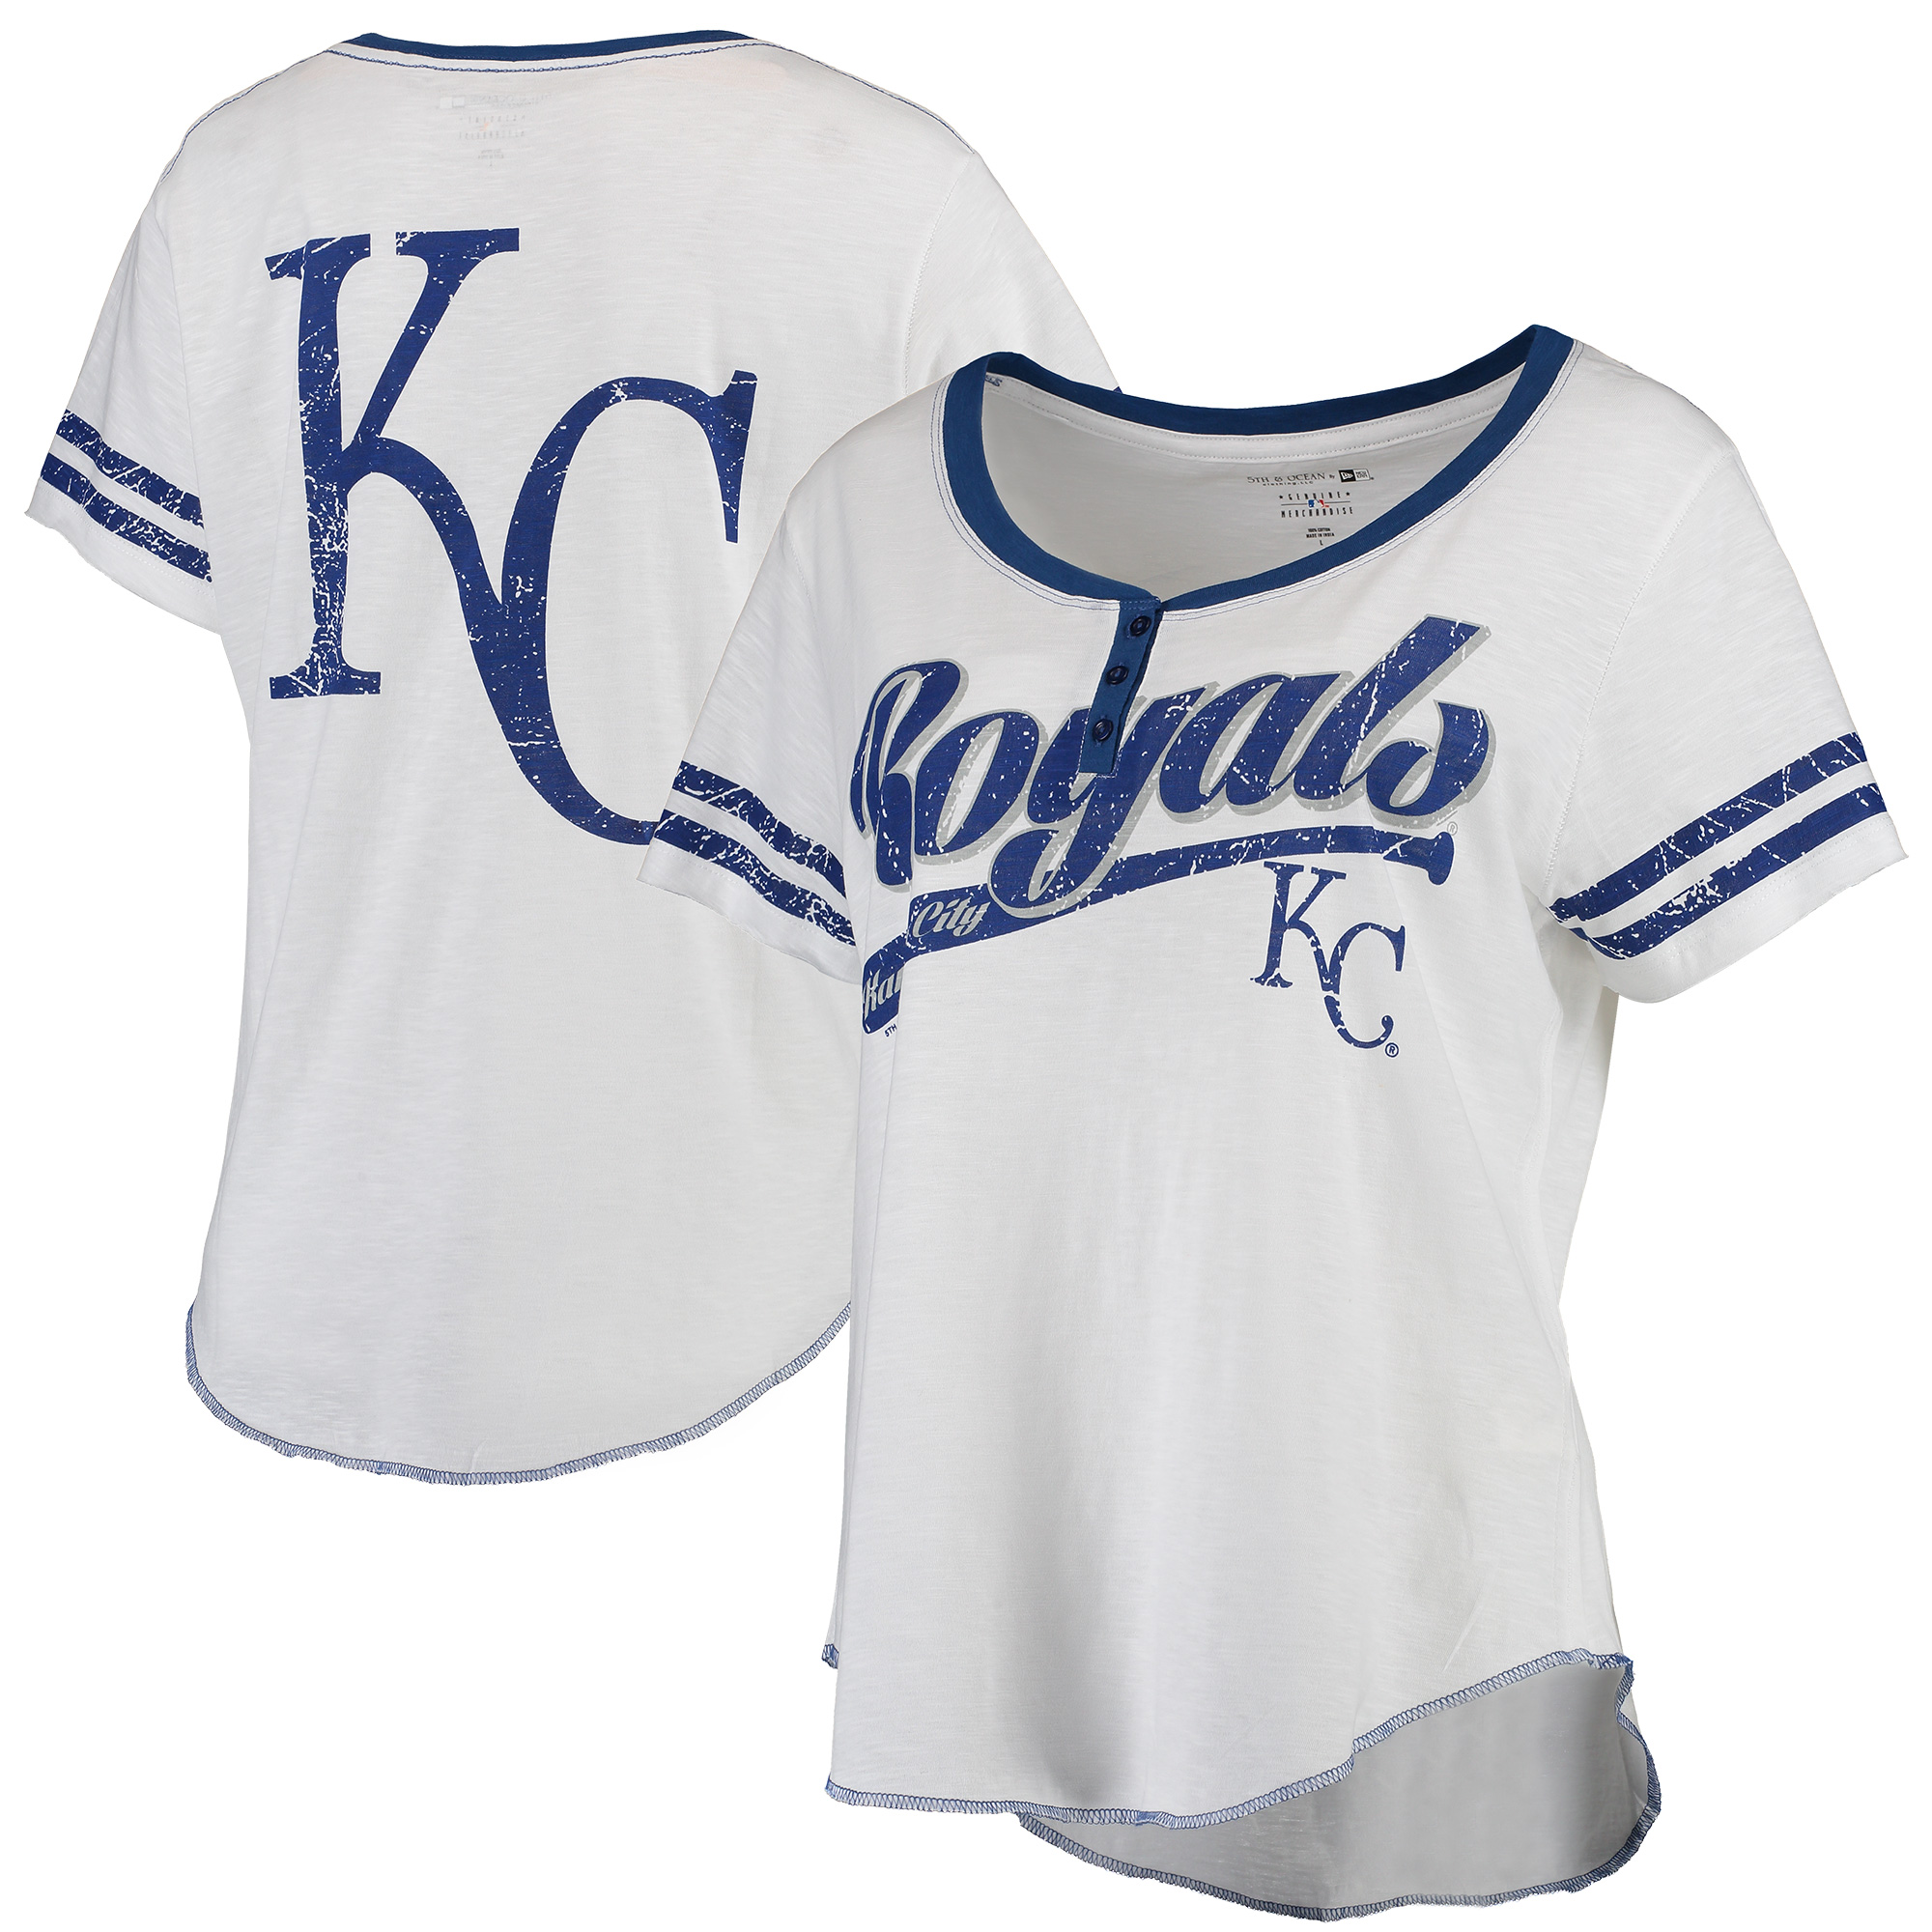 Kansas City Royals 5th & Ocean by New Era Women's Slub Jersey T-Shirt - White